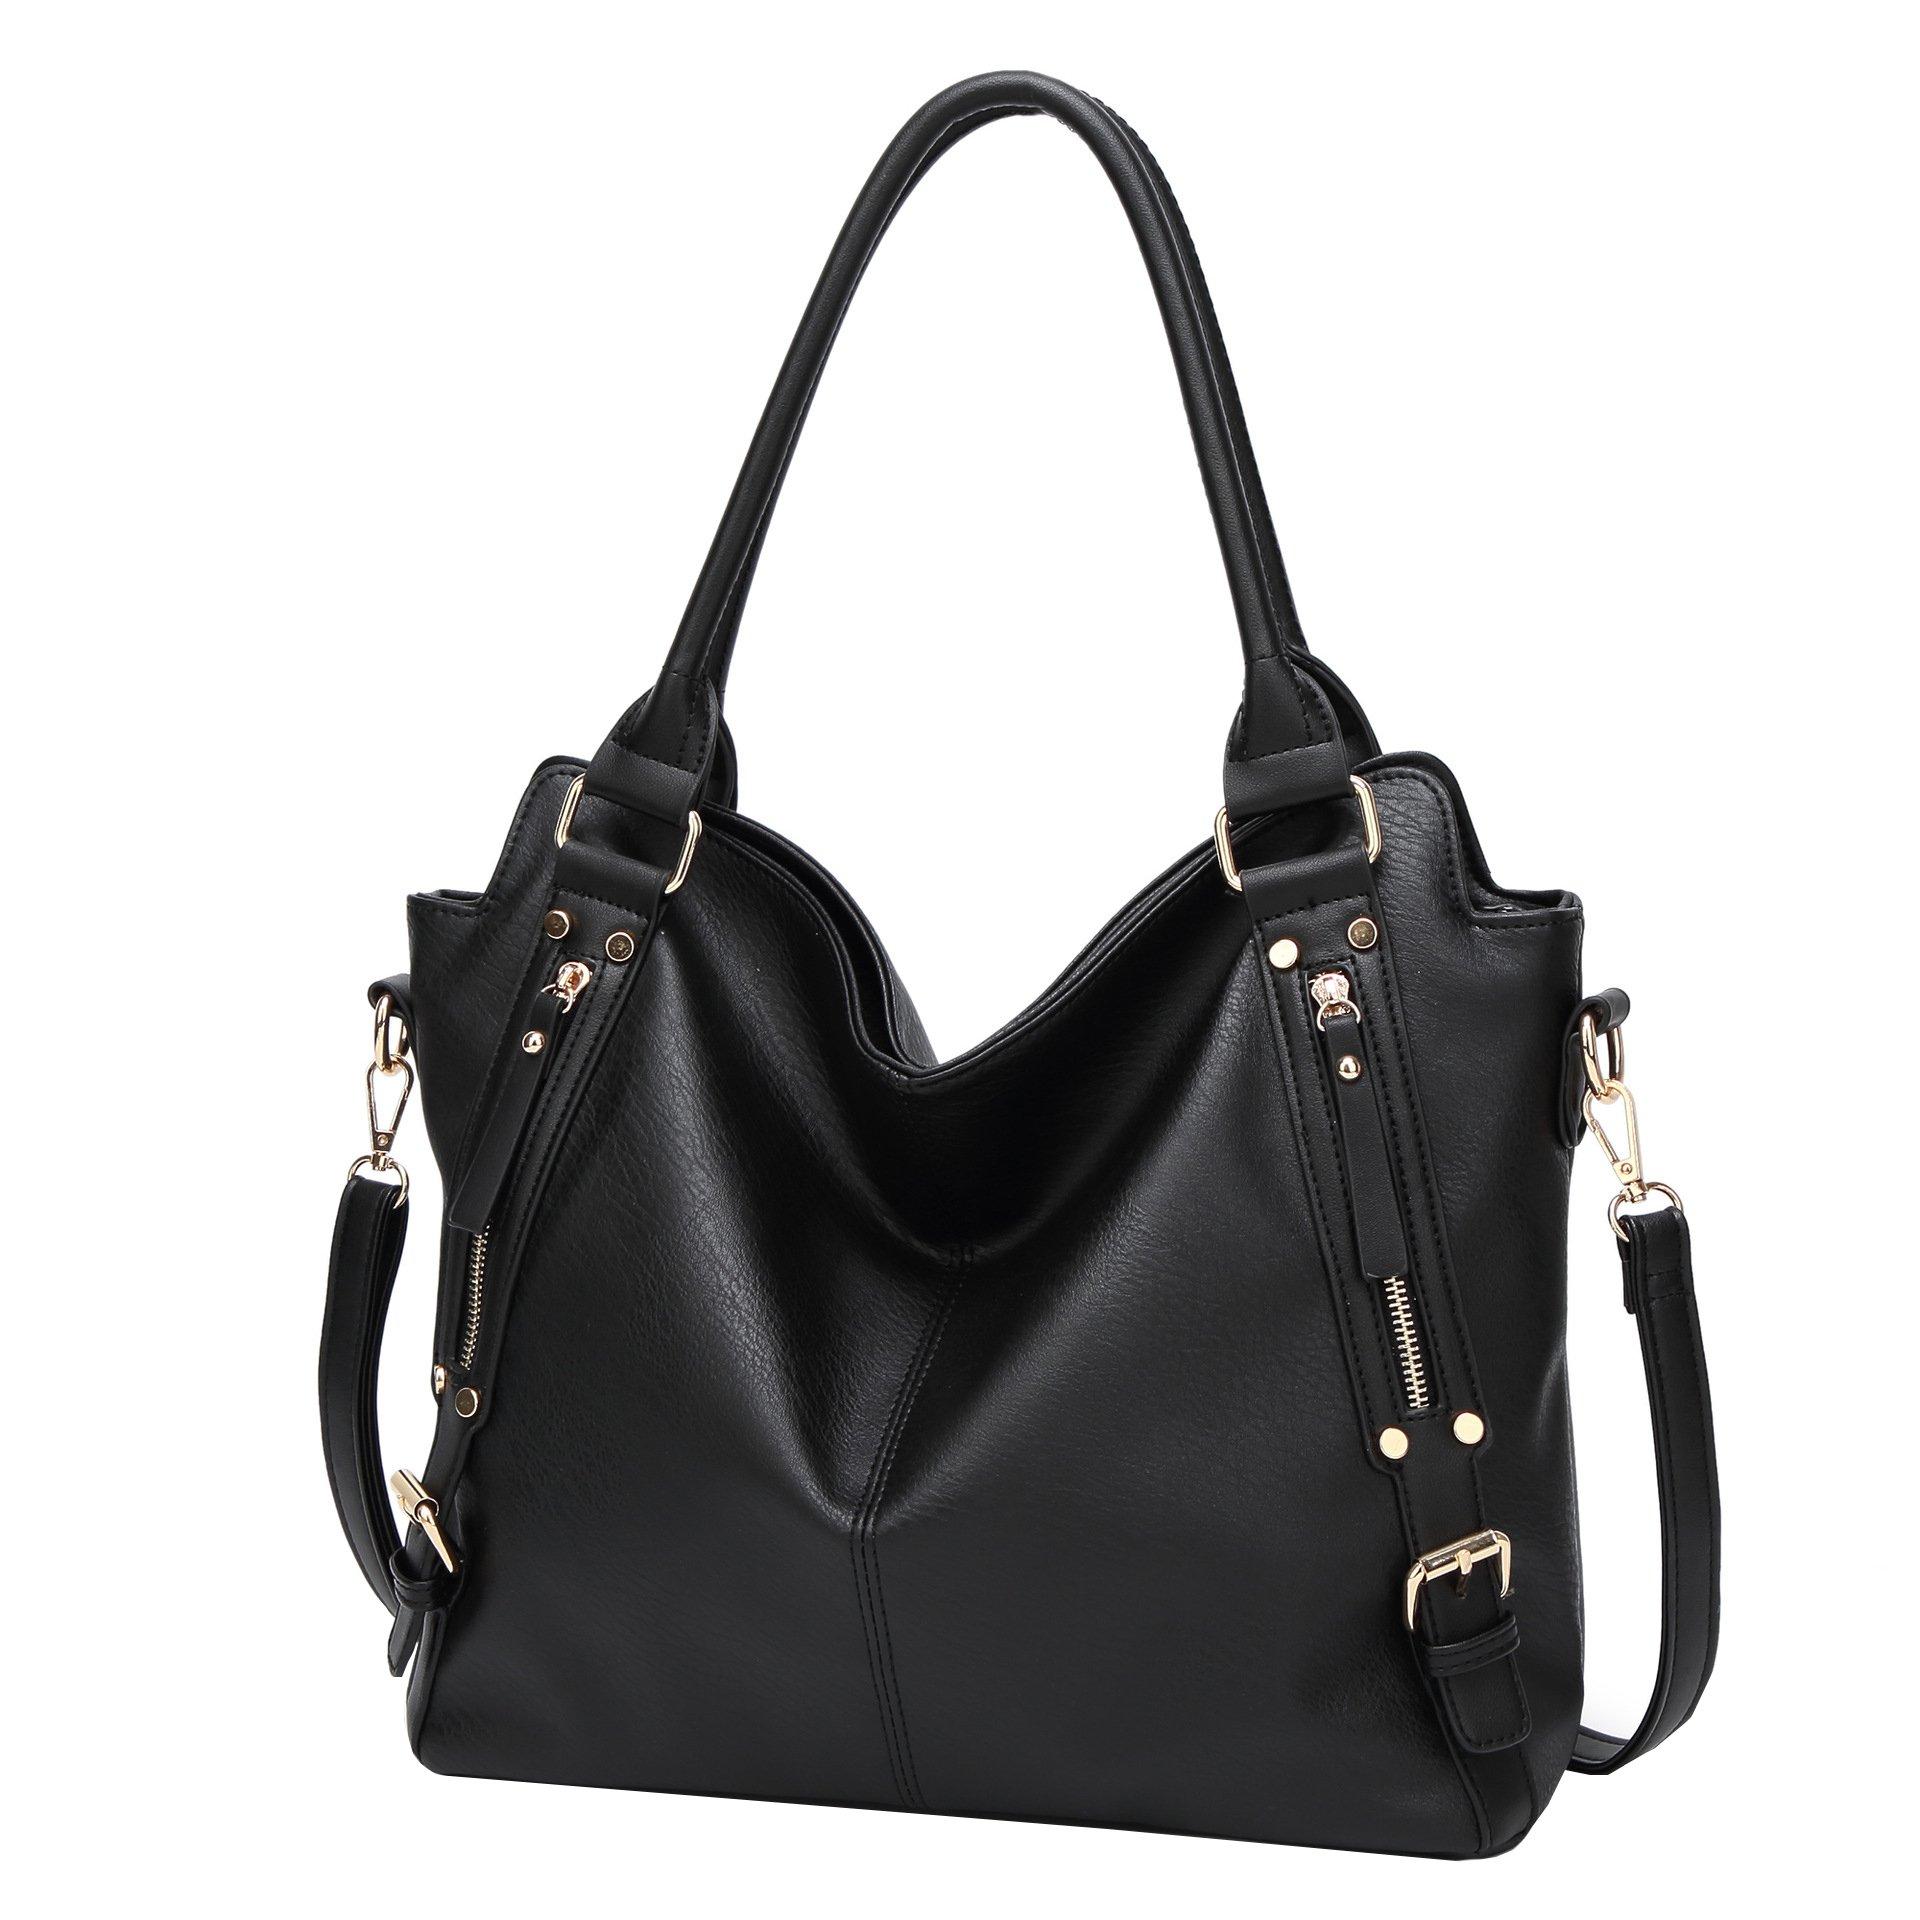 Obosoyo Women Shoulder Tote Satchel Bag Lady Messenger Purse Top Handle Hobo Handbags Black